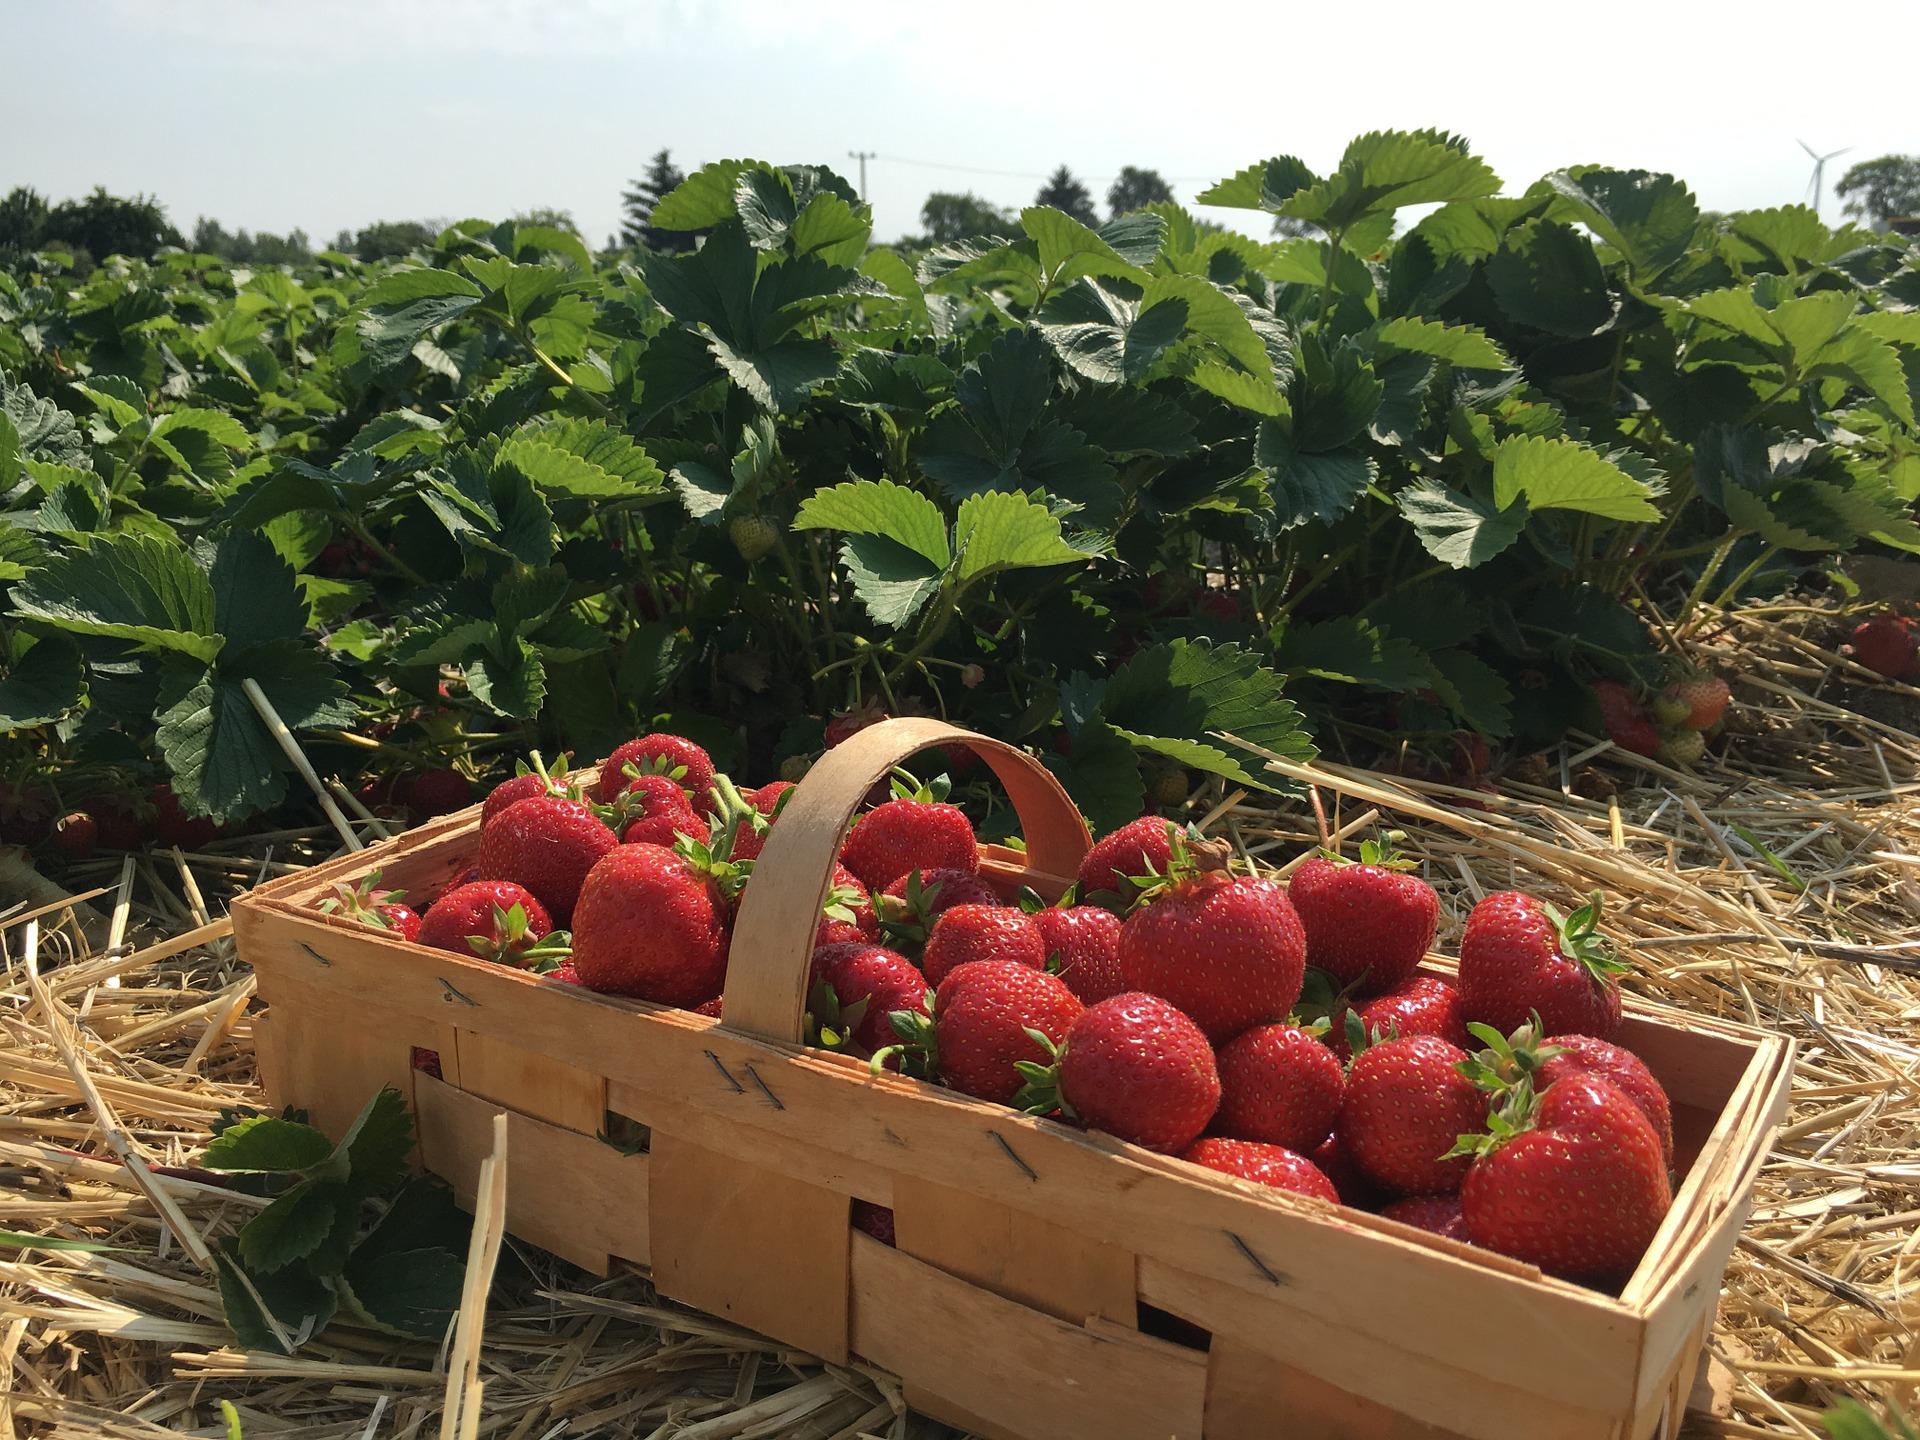 basket of strawberries in field